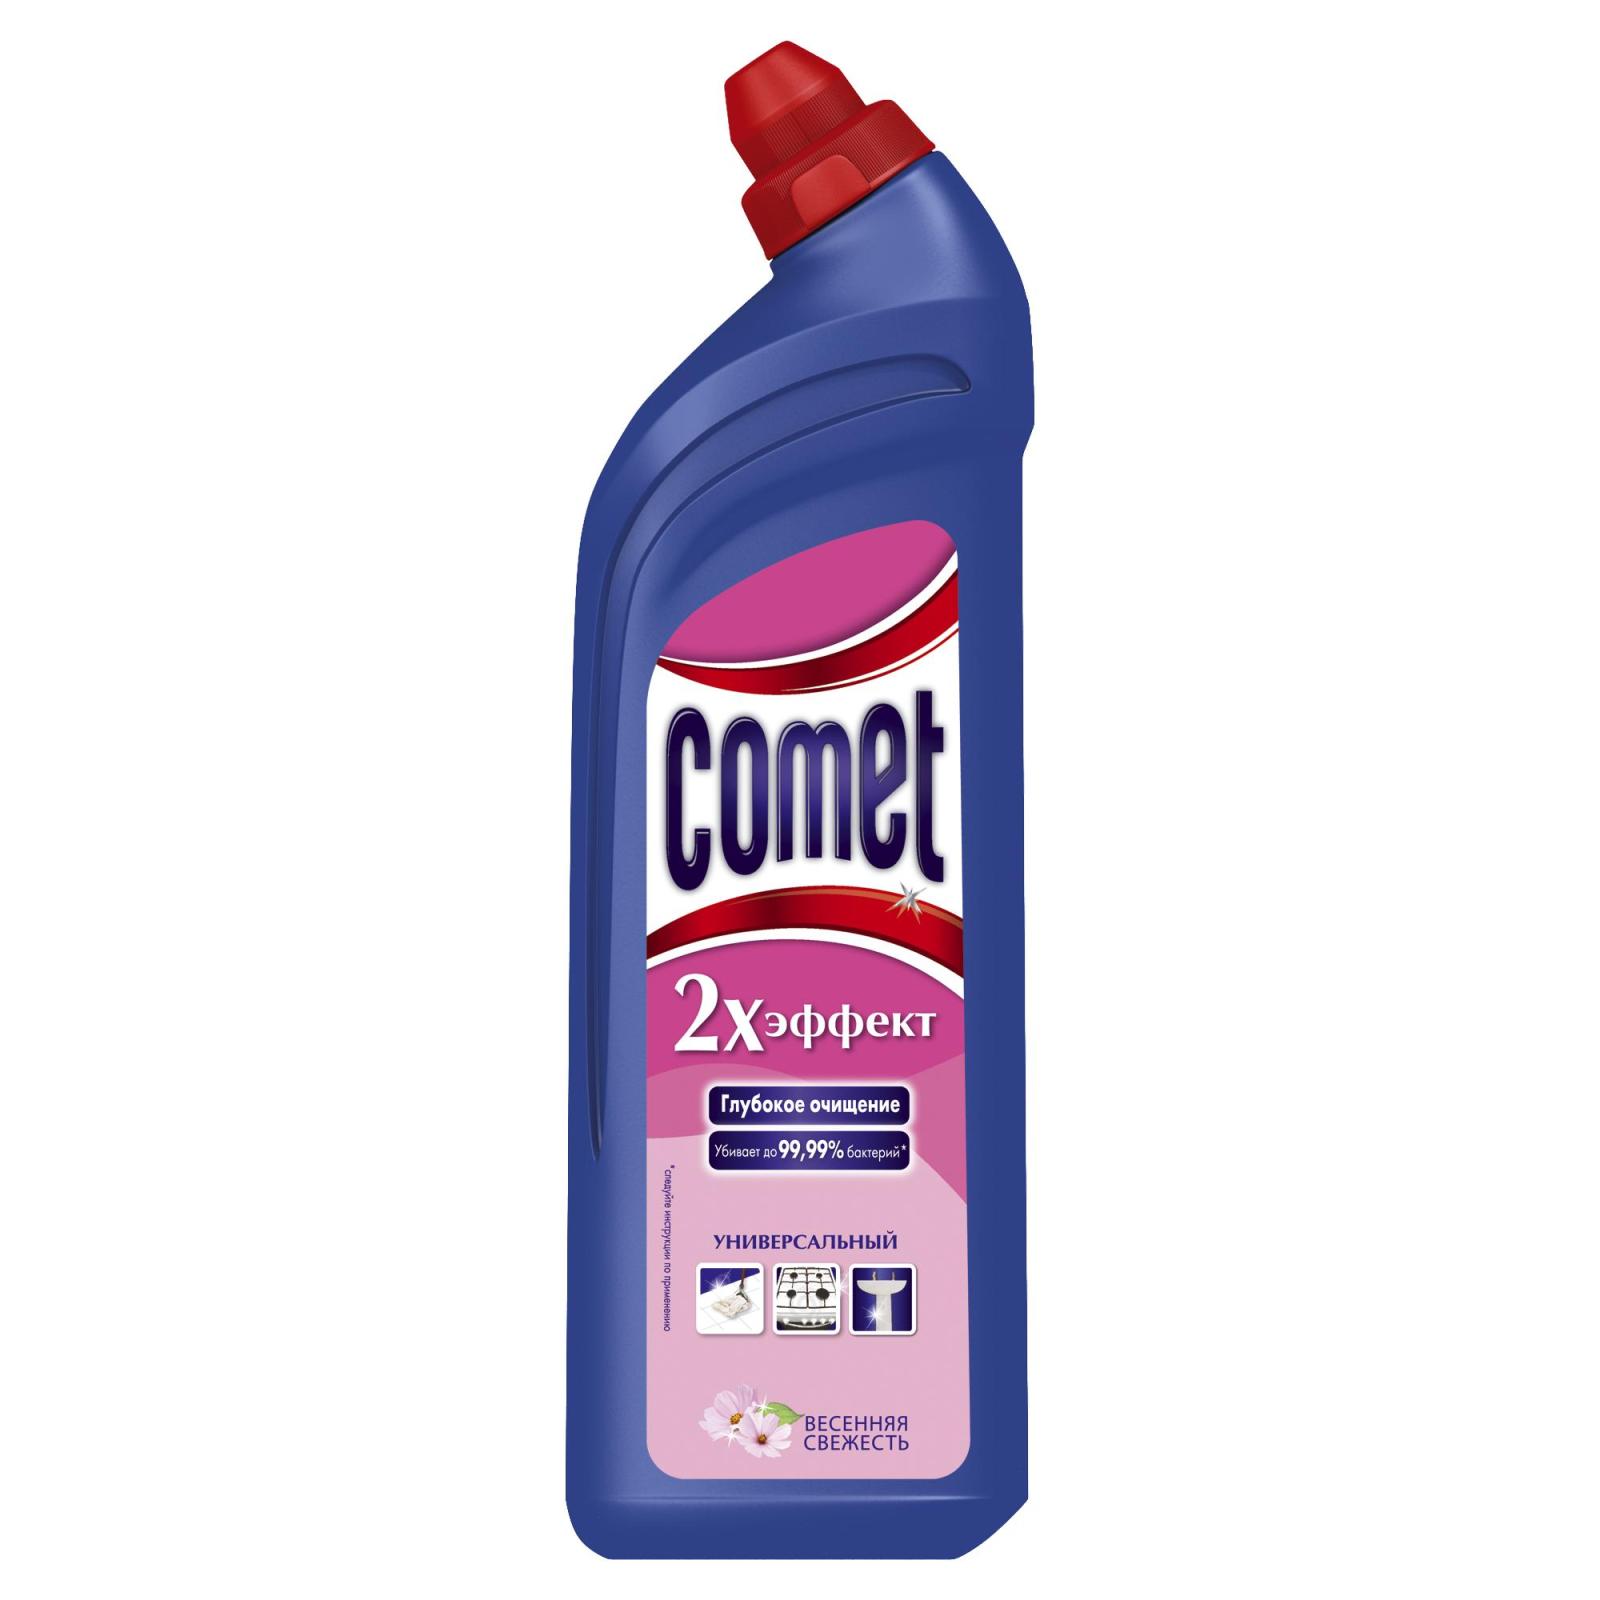 Средство для уборки Comet Весенняя свежесть 1 л (4015600411954)